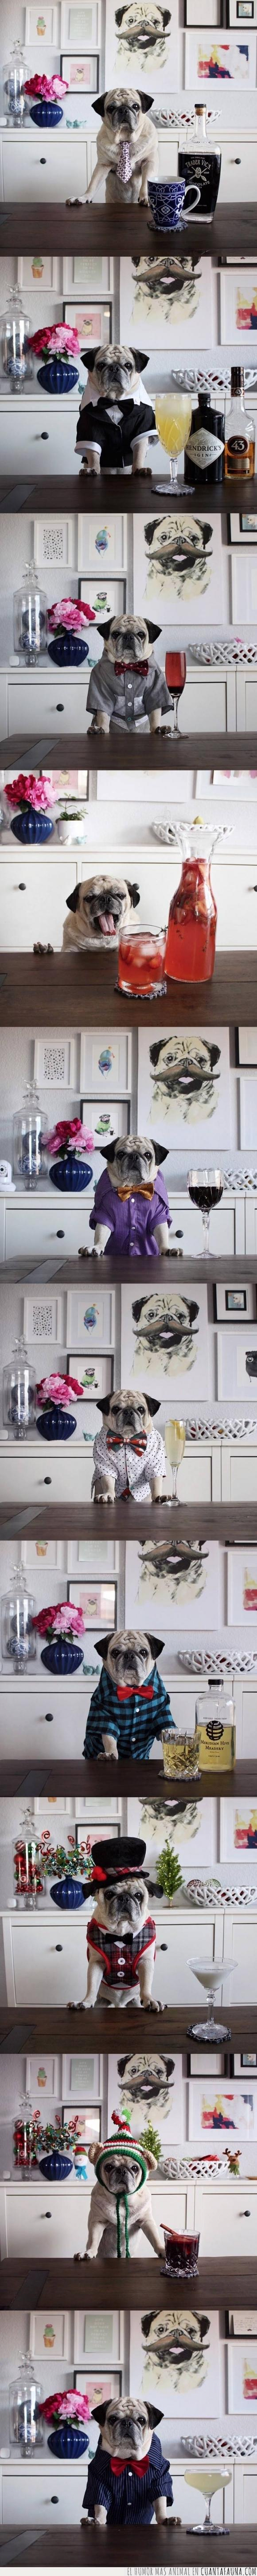 beber,bebida,cocktail,perro,pug,traje